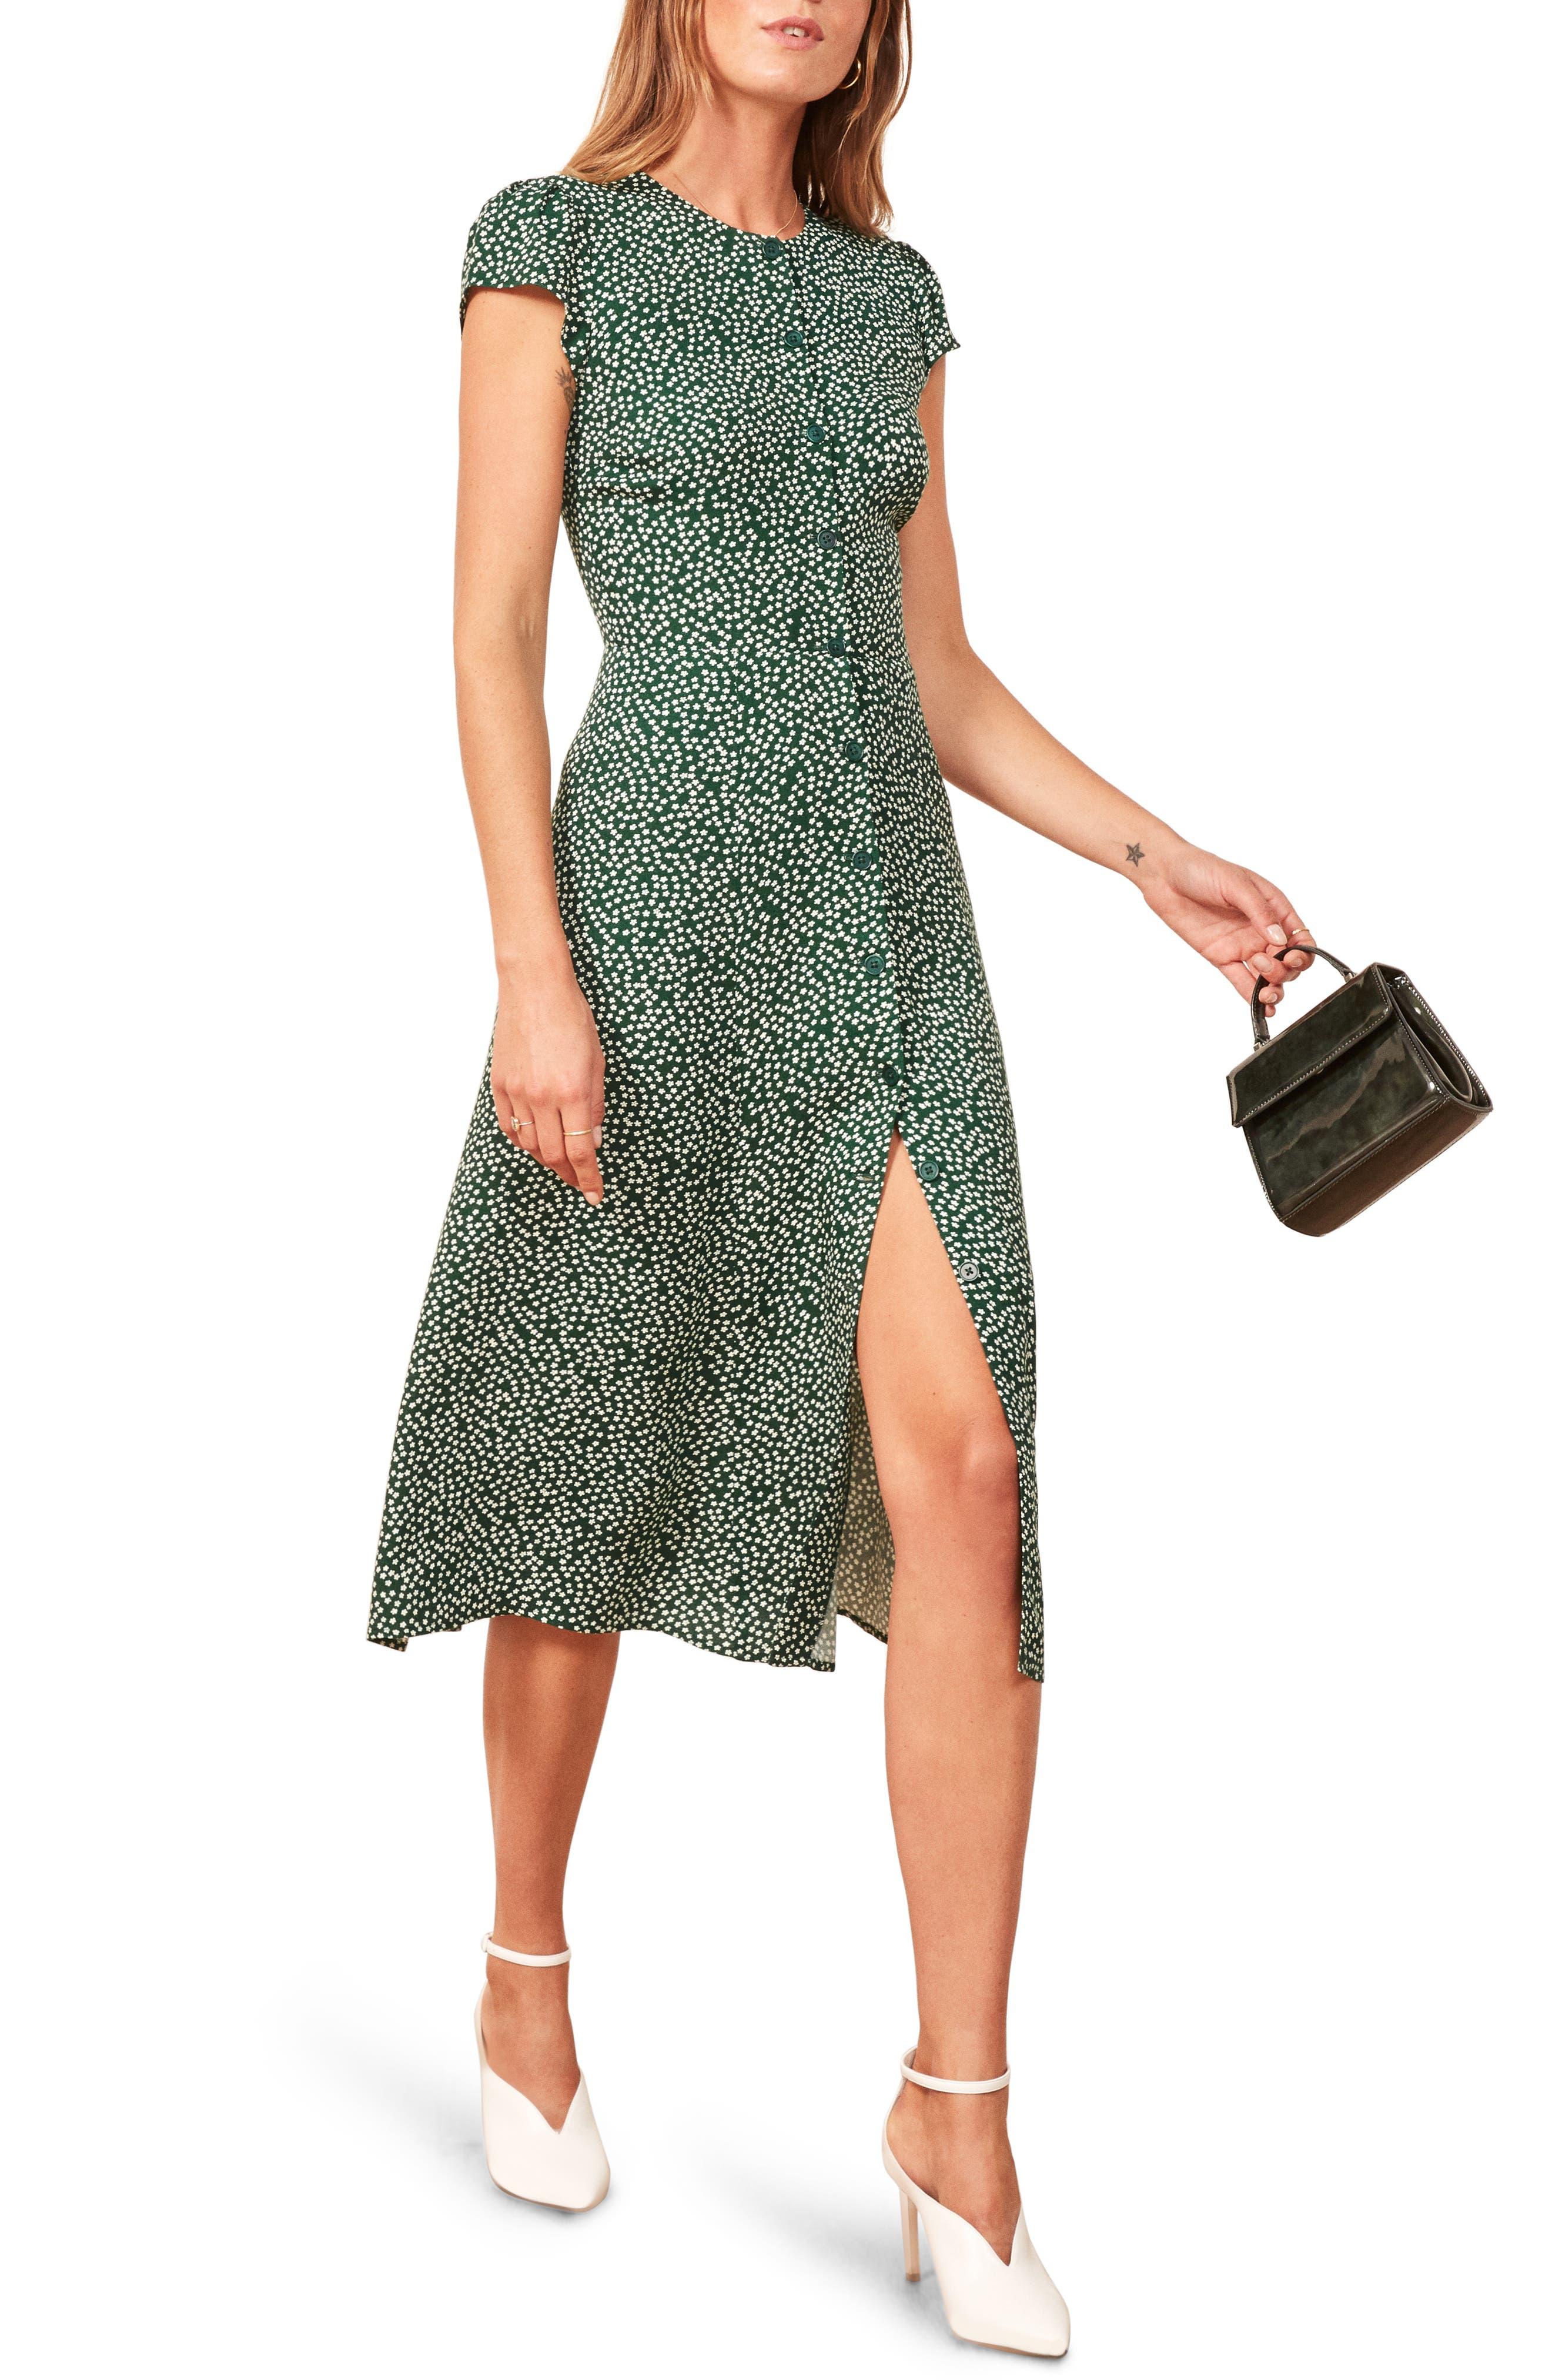 Pewter Knee Length Dress